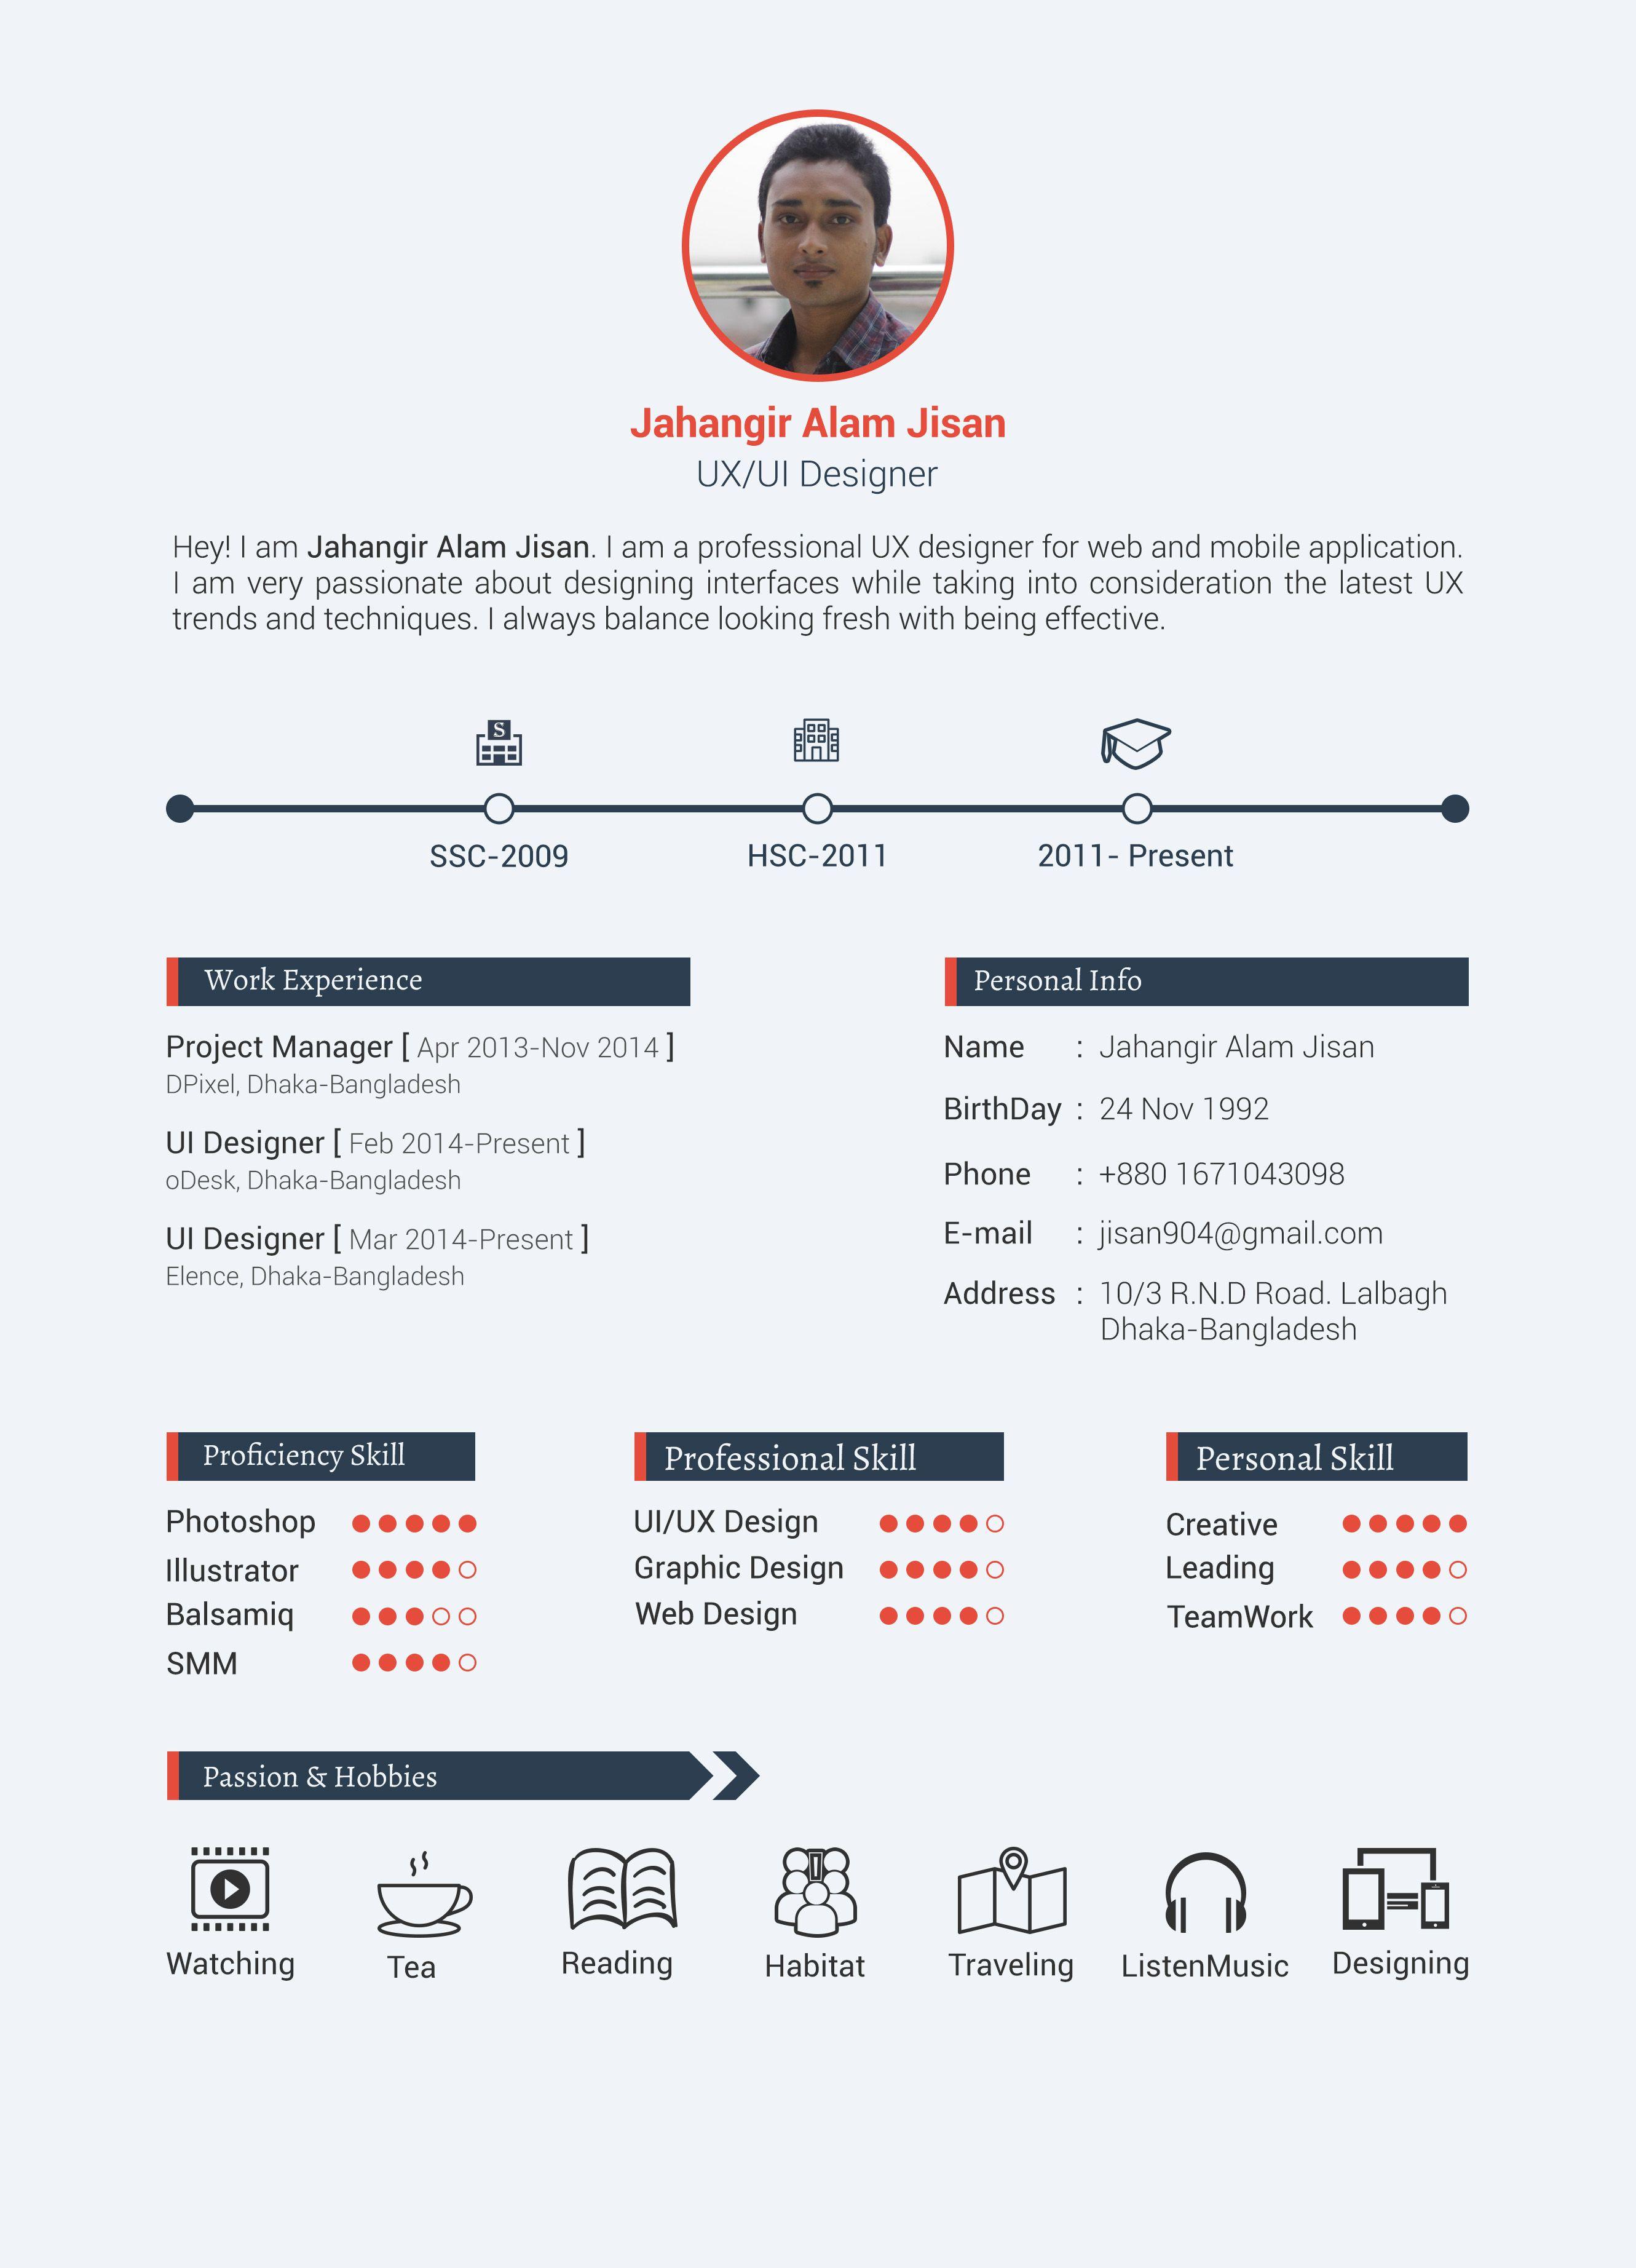 Example 13 I Will Design Resume Awesome Cv For You For 5 Https Www Fiverr Com Taitsu Design Resume Aweso Resume Tips Resume Skills Resume Skills Section